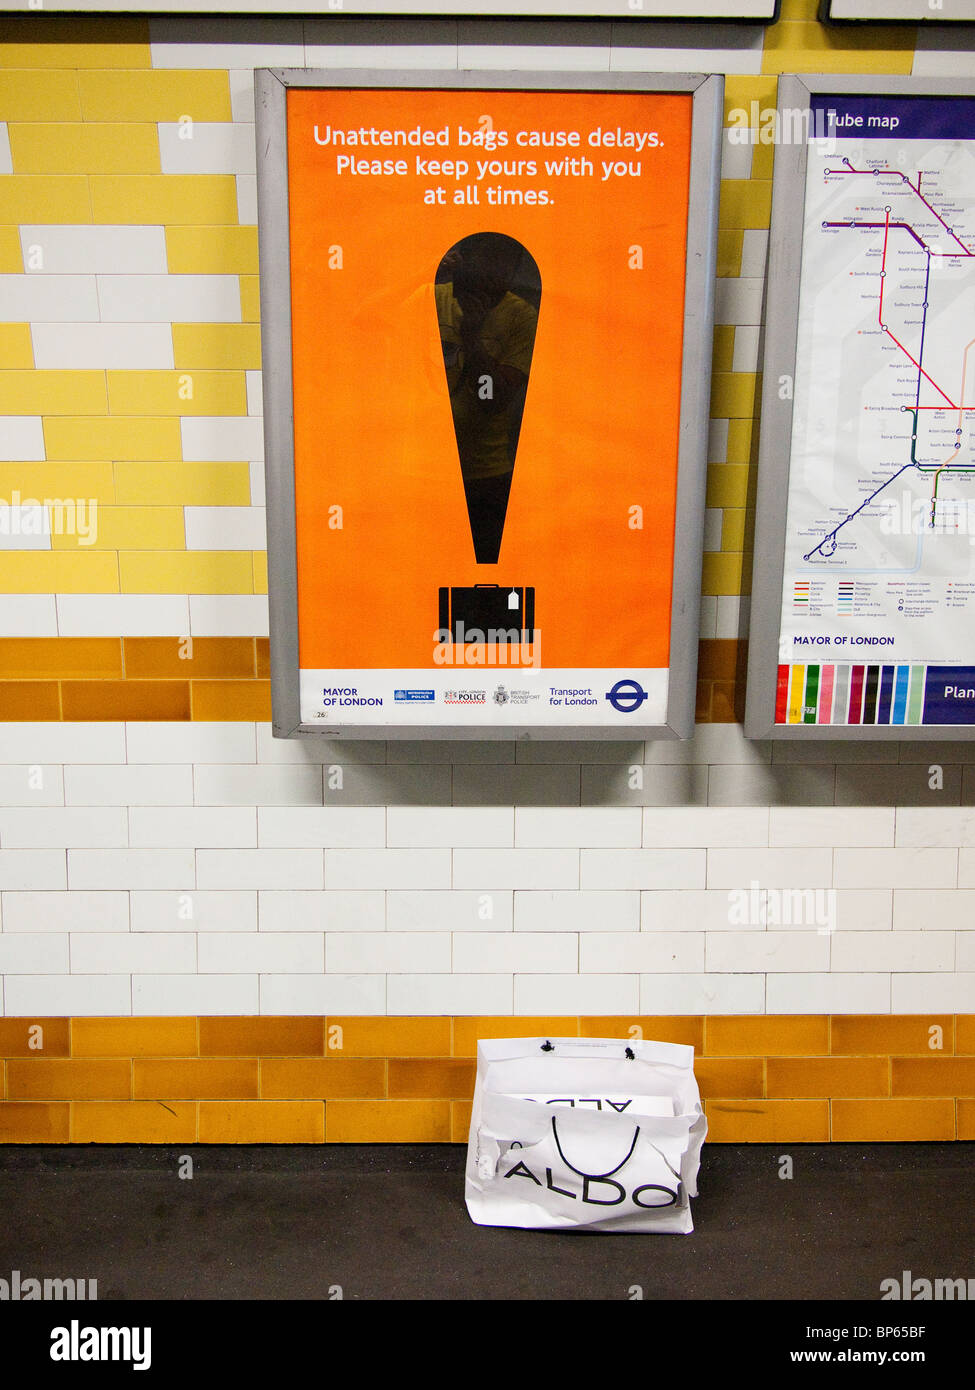 Unattended Bag Sign, London Underground - Stock Image